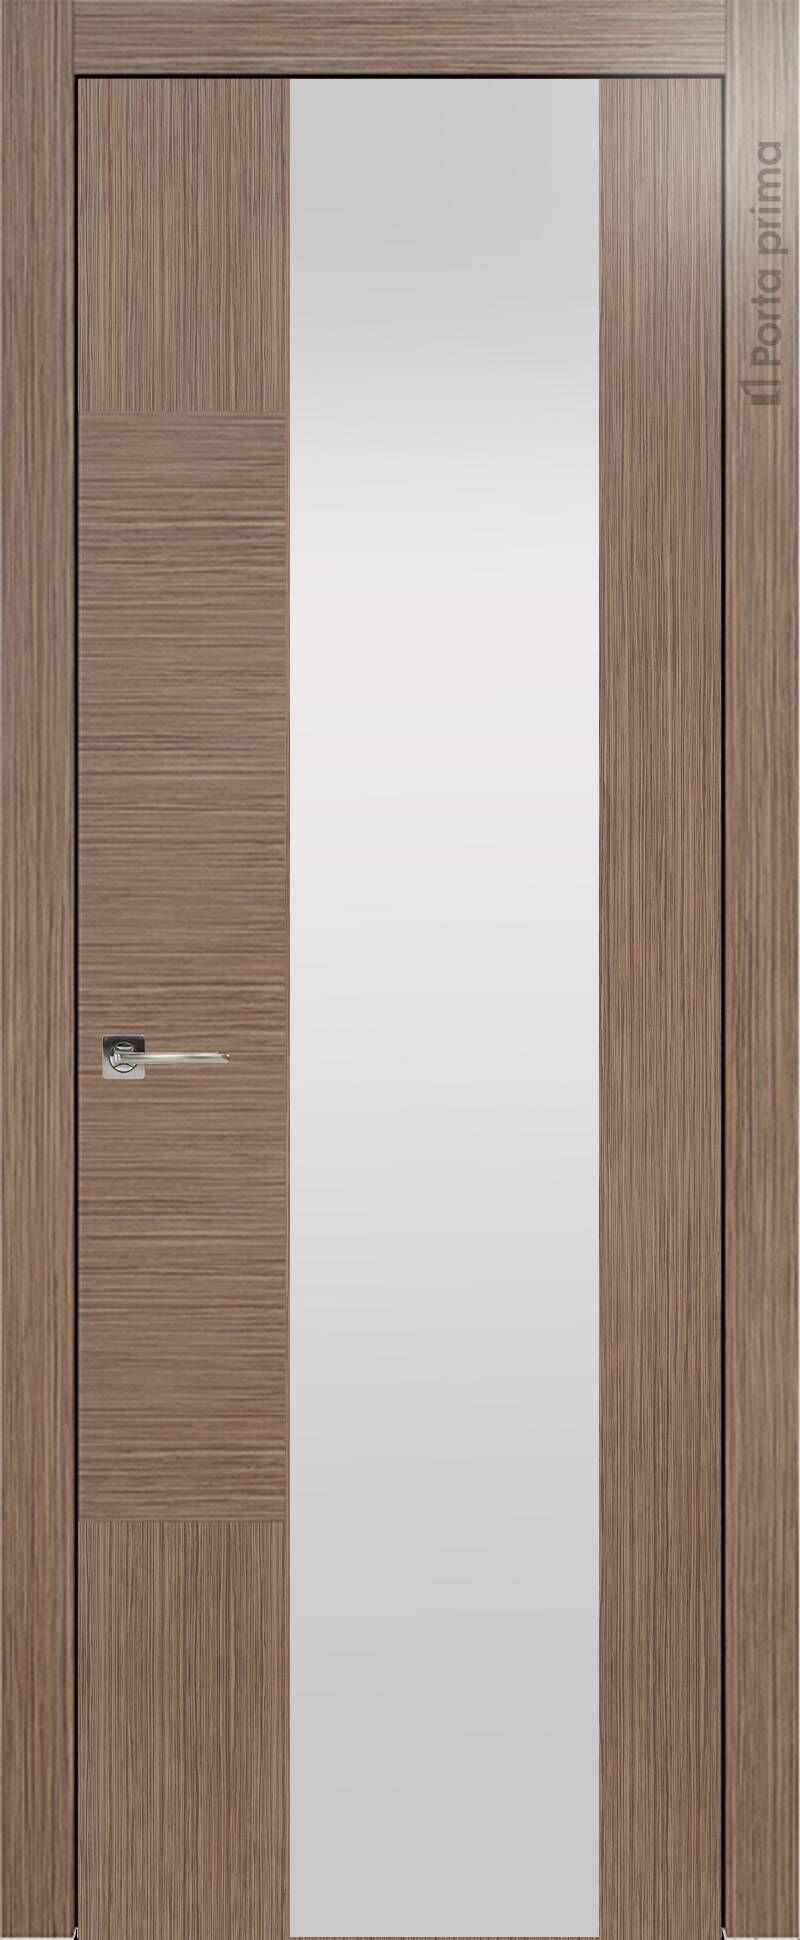 Tivoli Е-1 цвет - Орех Со стеклом (ДО)